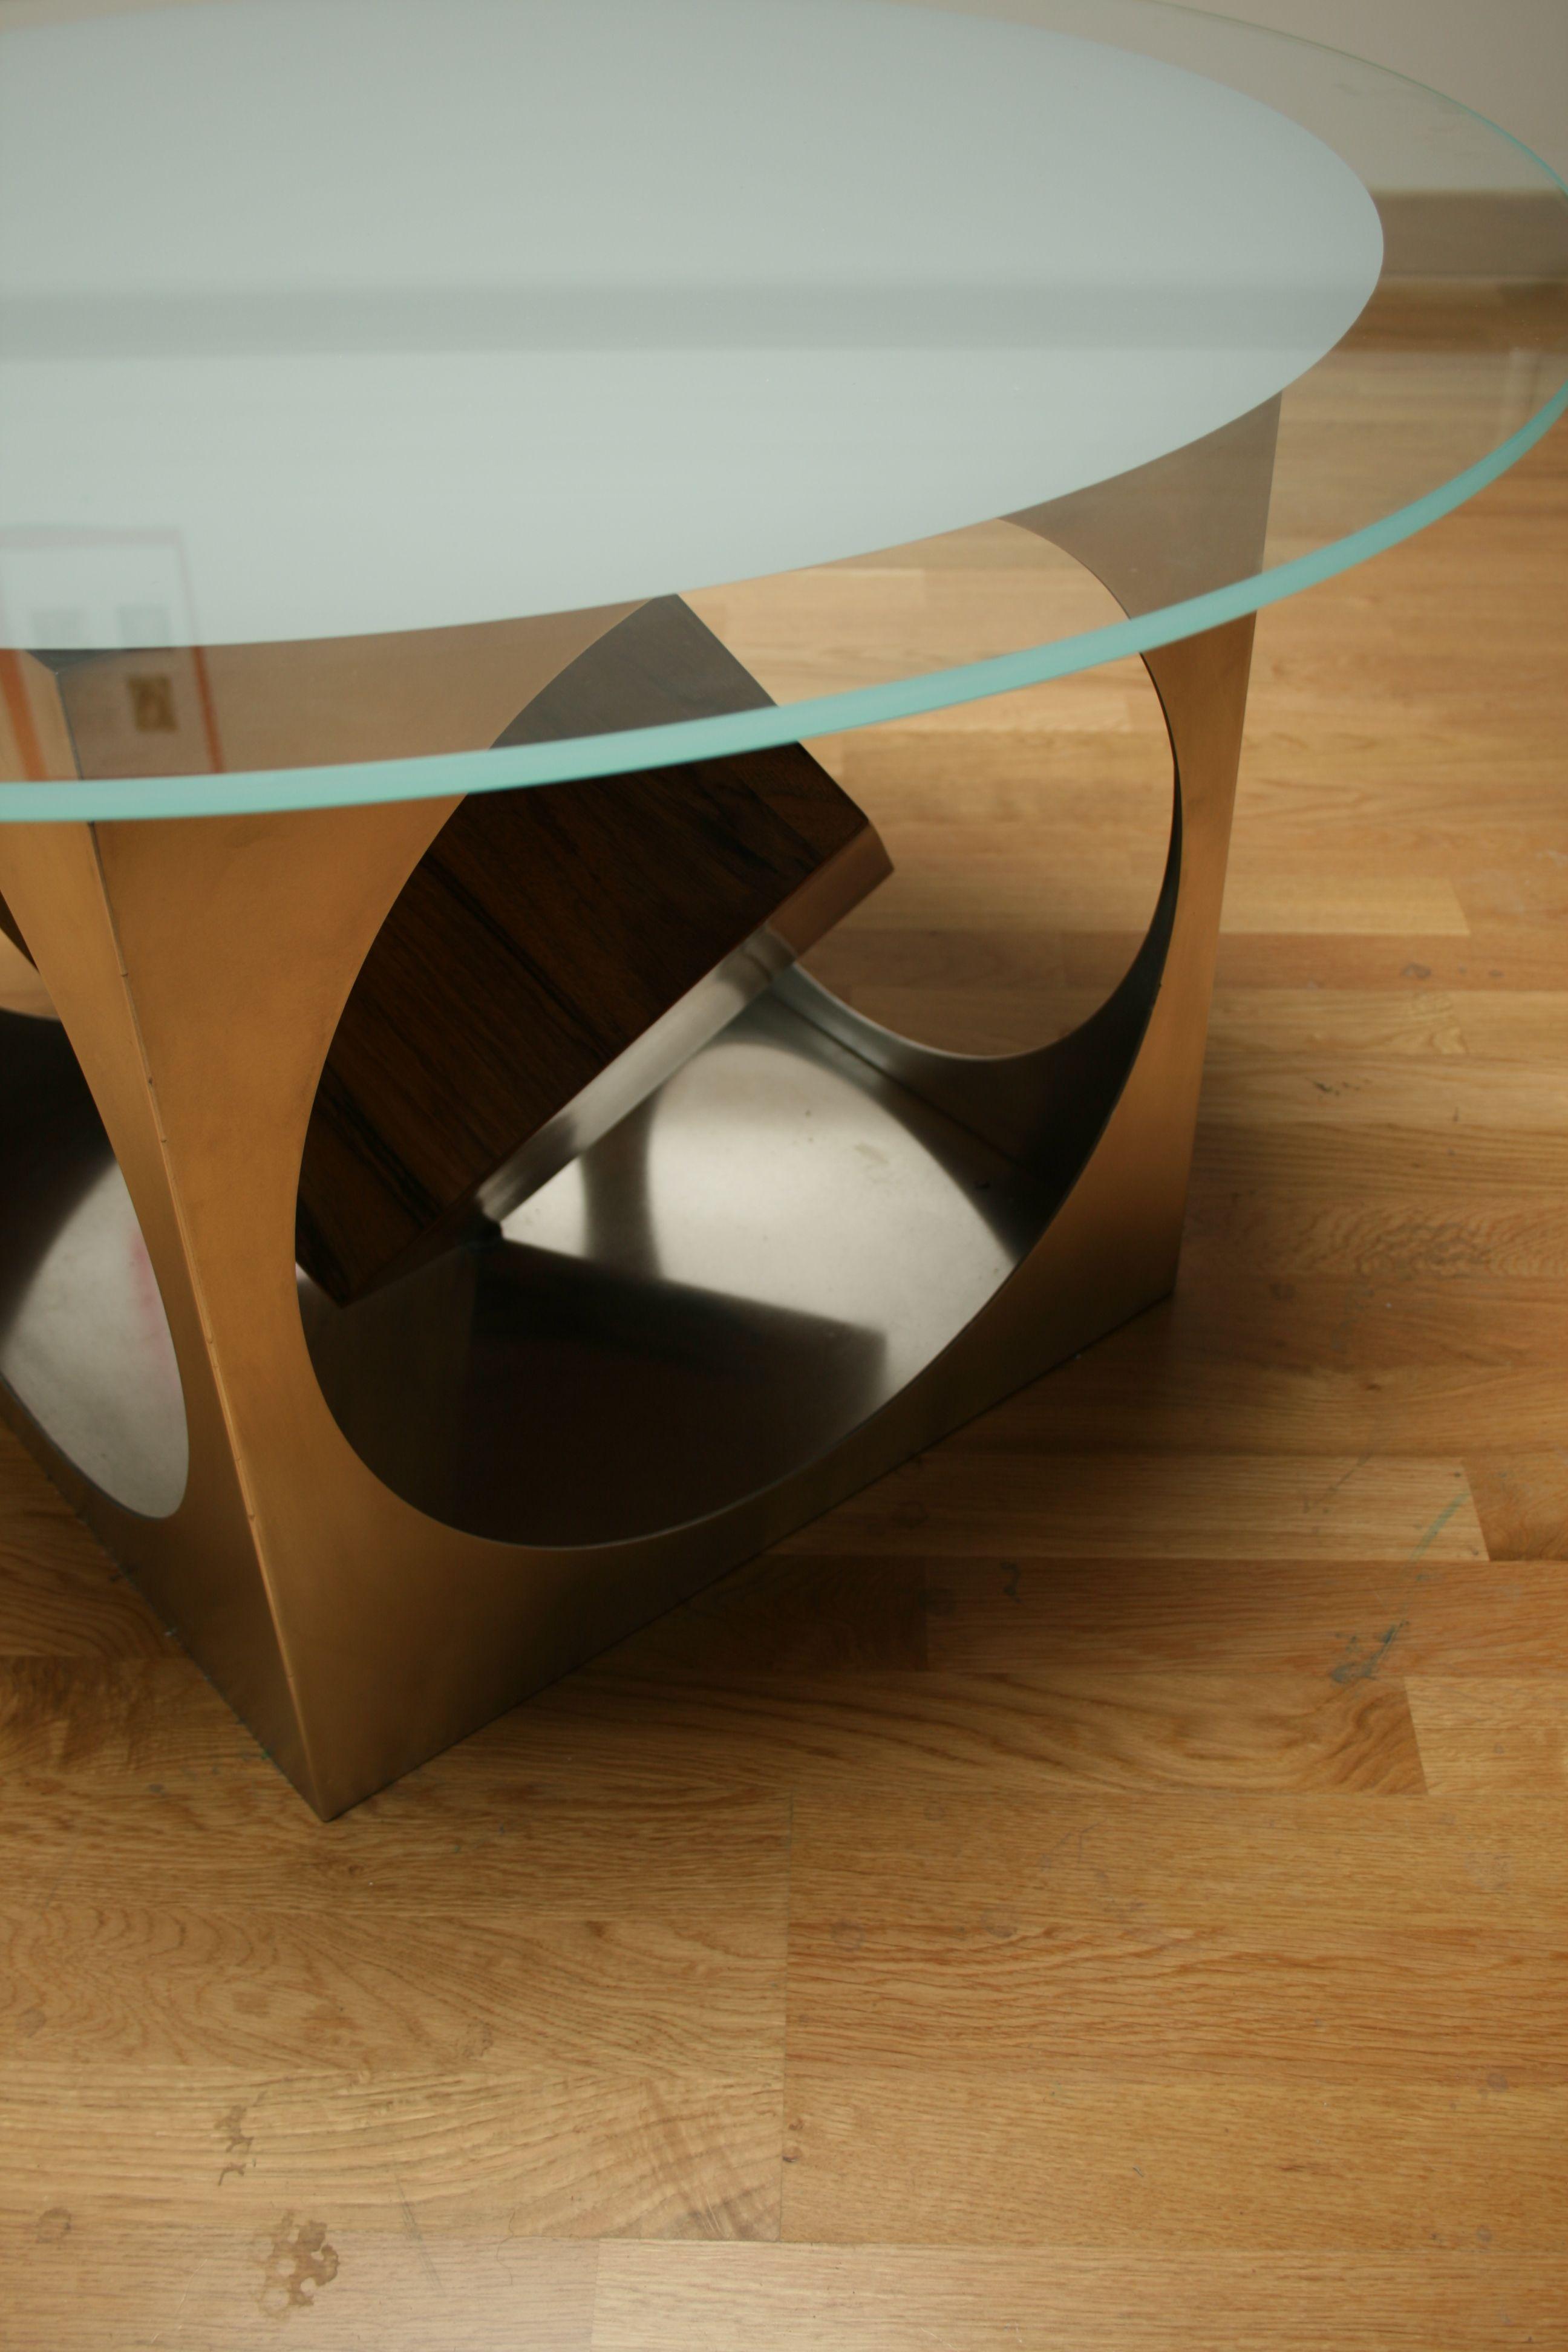 9ea1a7f00202def35dc92db4cf11b959 Unique De Table Basse Noyer Design Concept